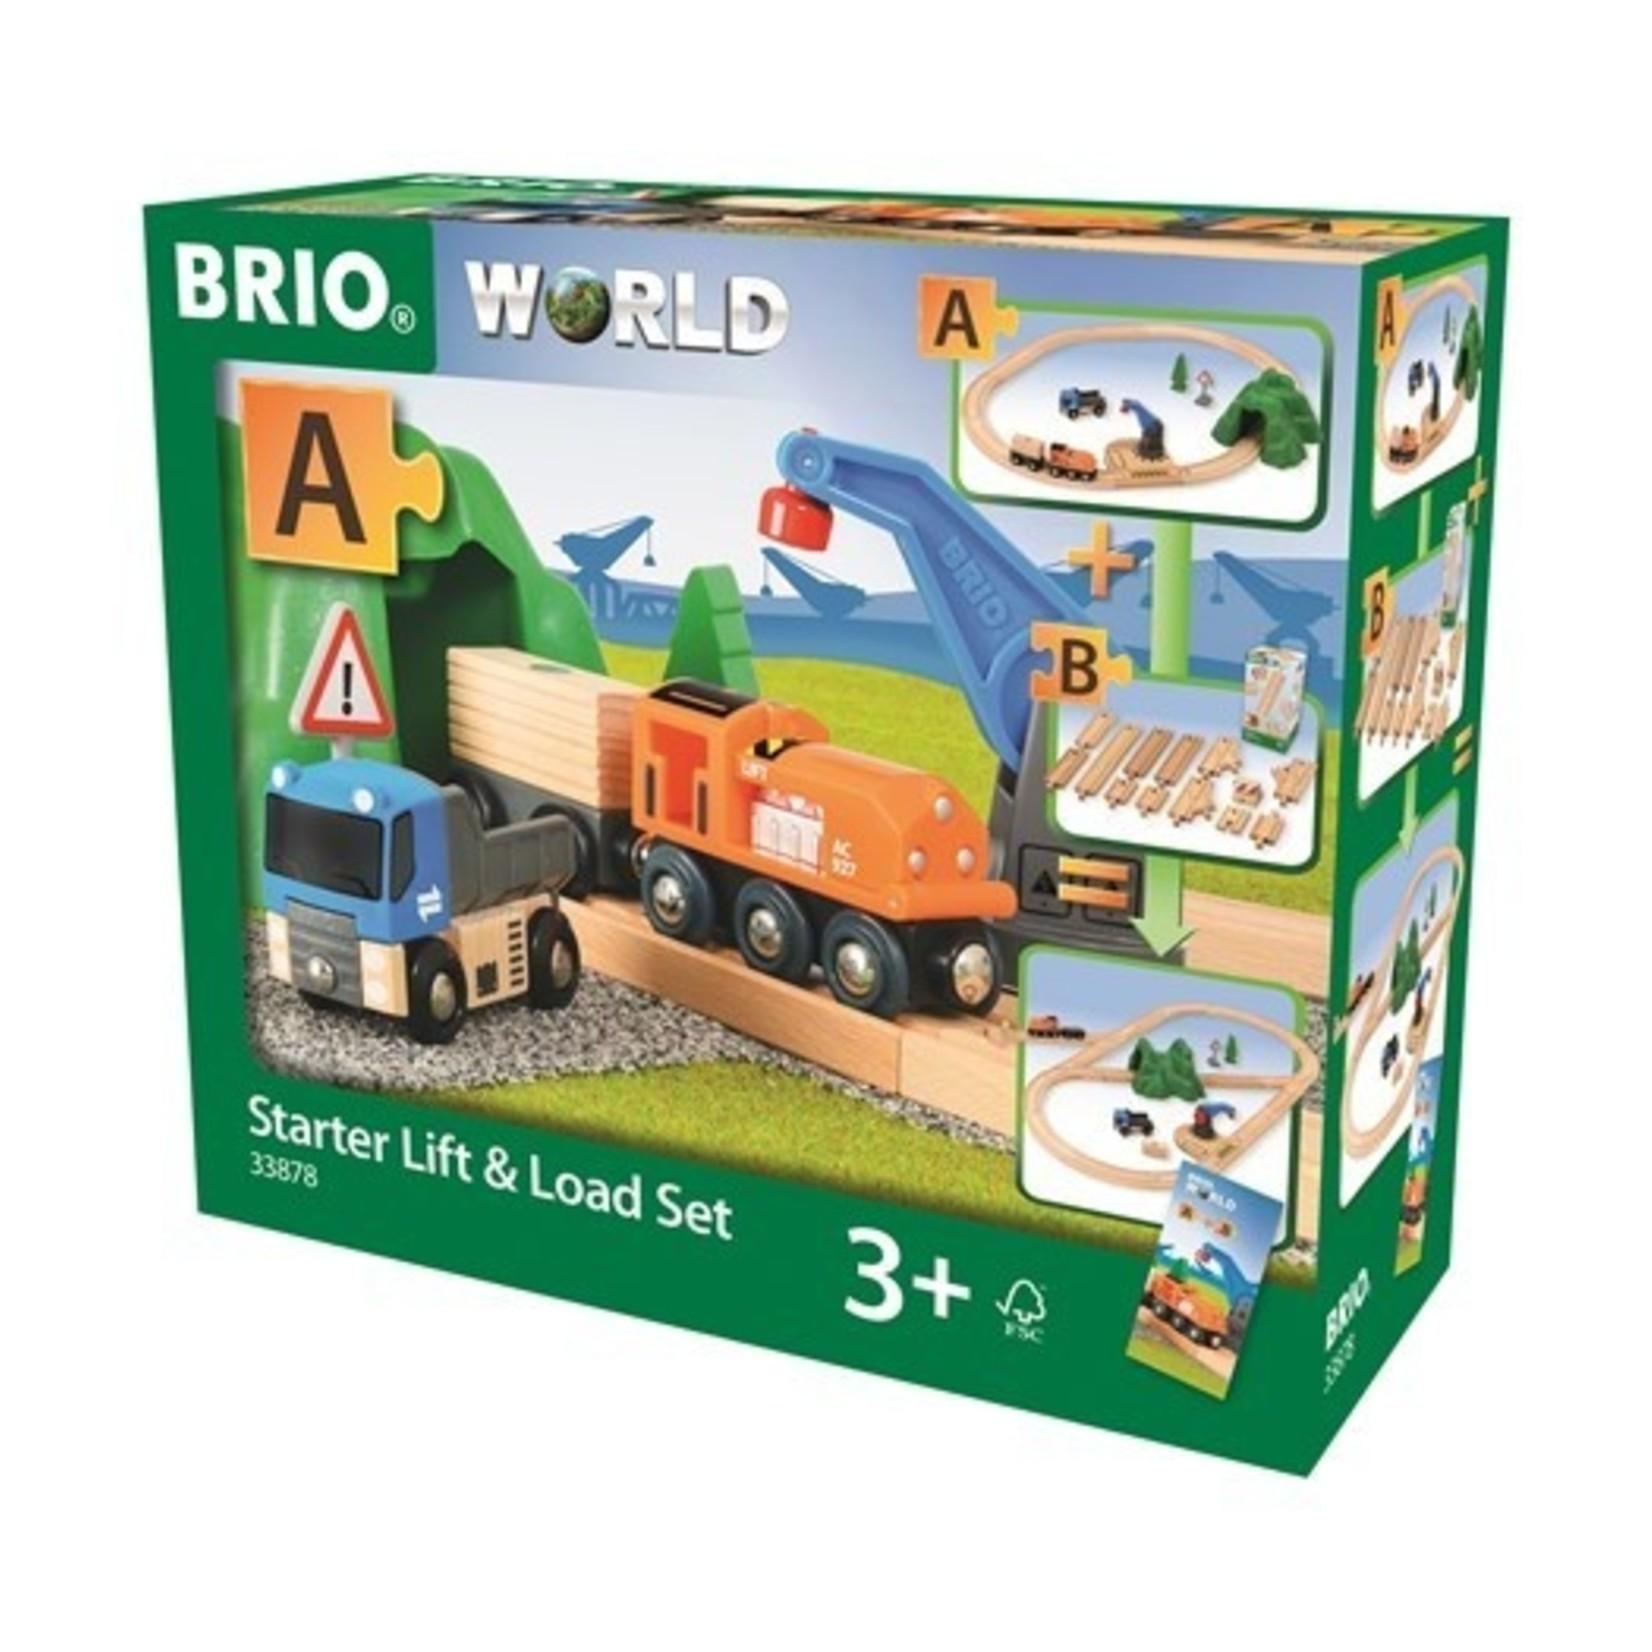 Brio Starter Lift & Load Set